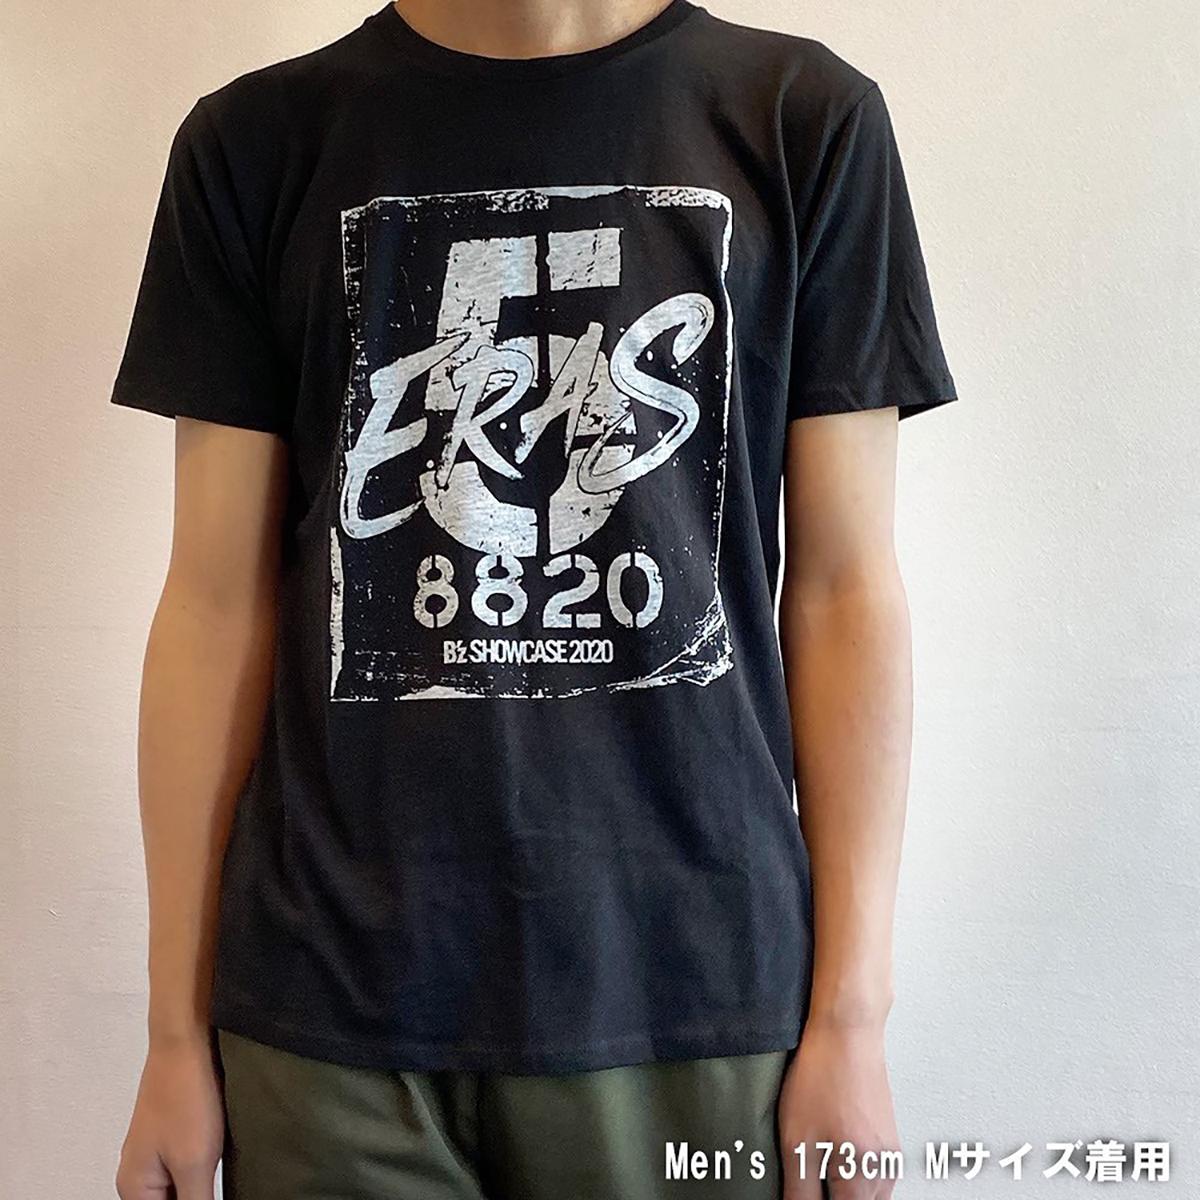 『B'z SHOWCASE 2020 -5 ERAS 8820- Day1~5』スタッフTシャツ着用写真